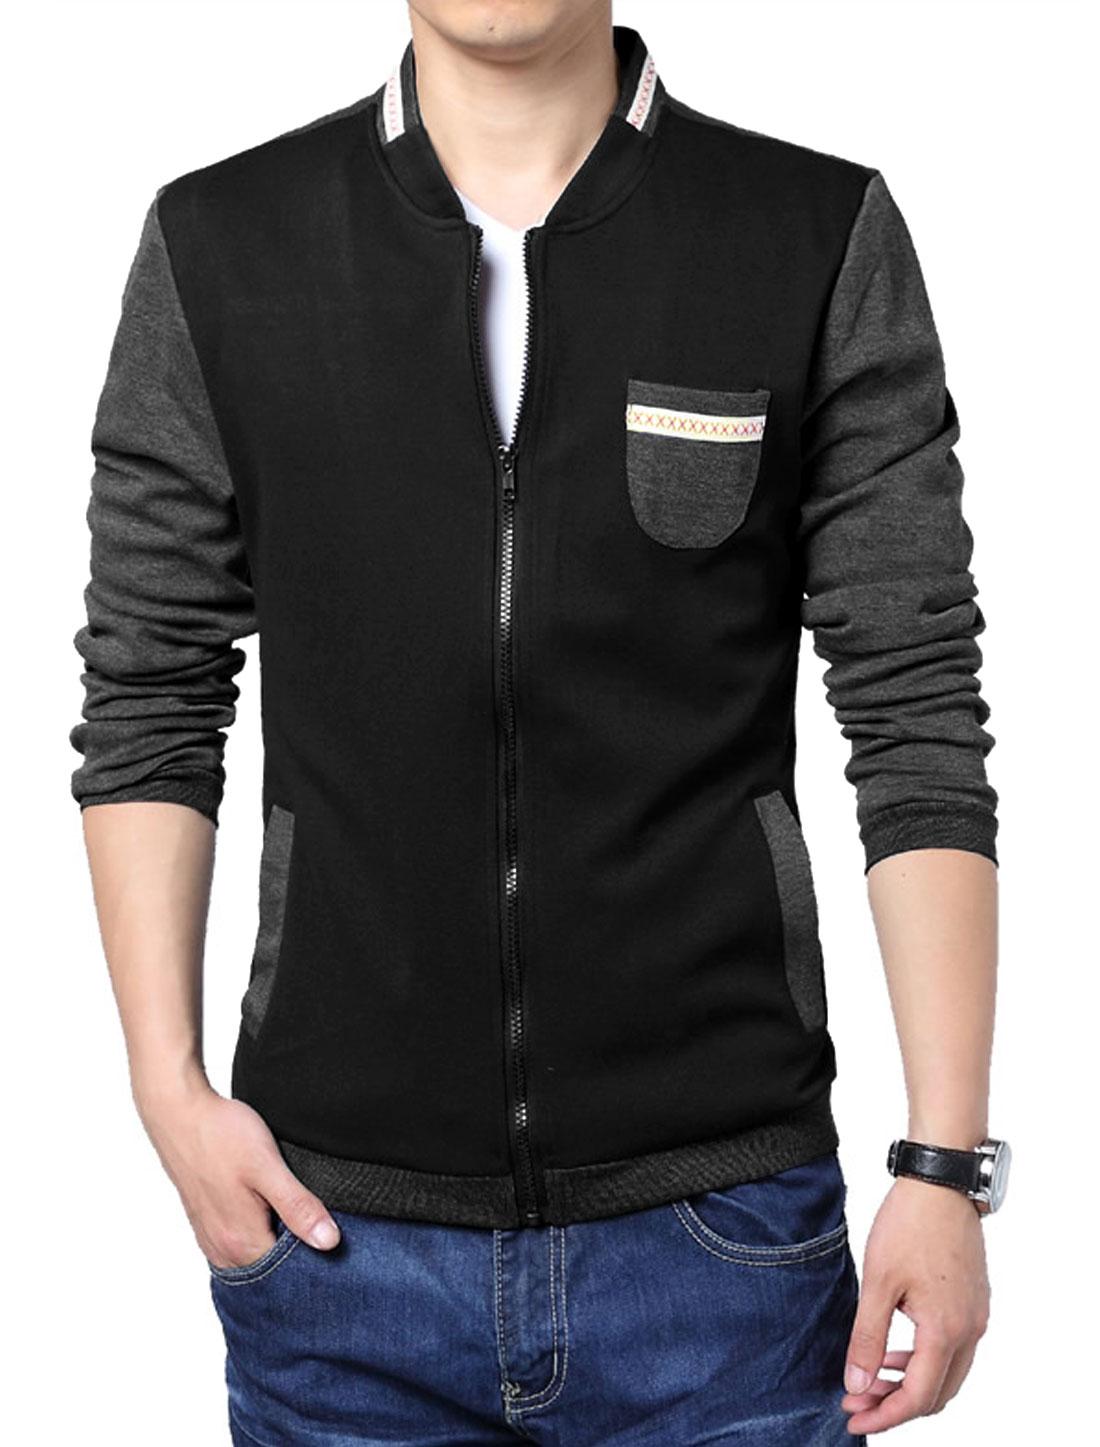 Men Long Sleeve Zipper Closure Colorblock Basic Jacket Black L